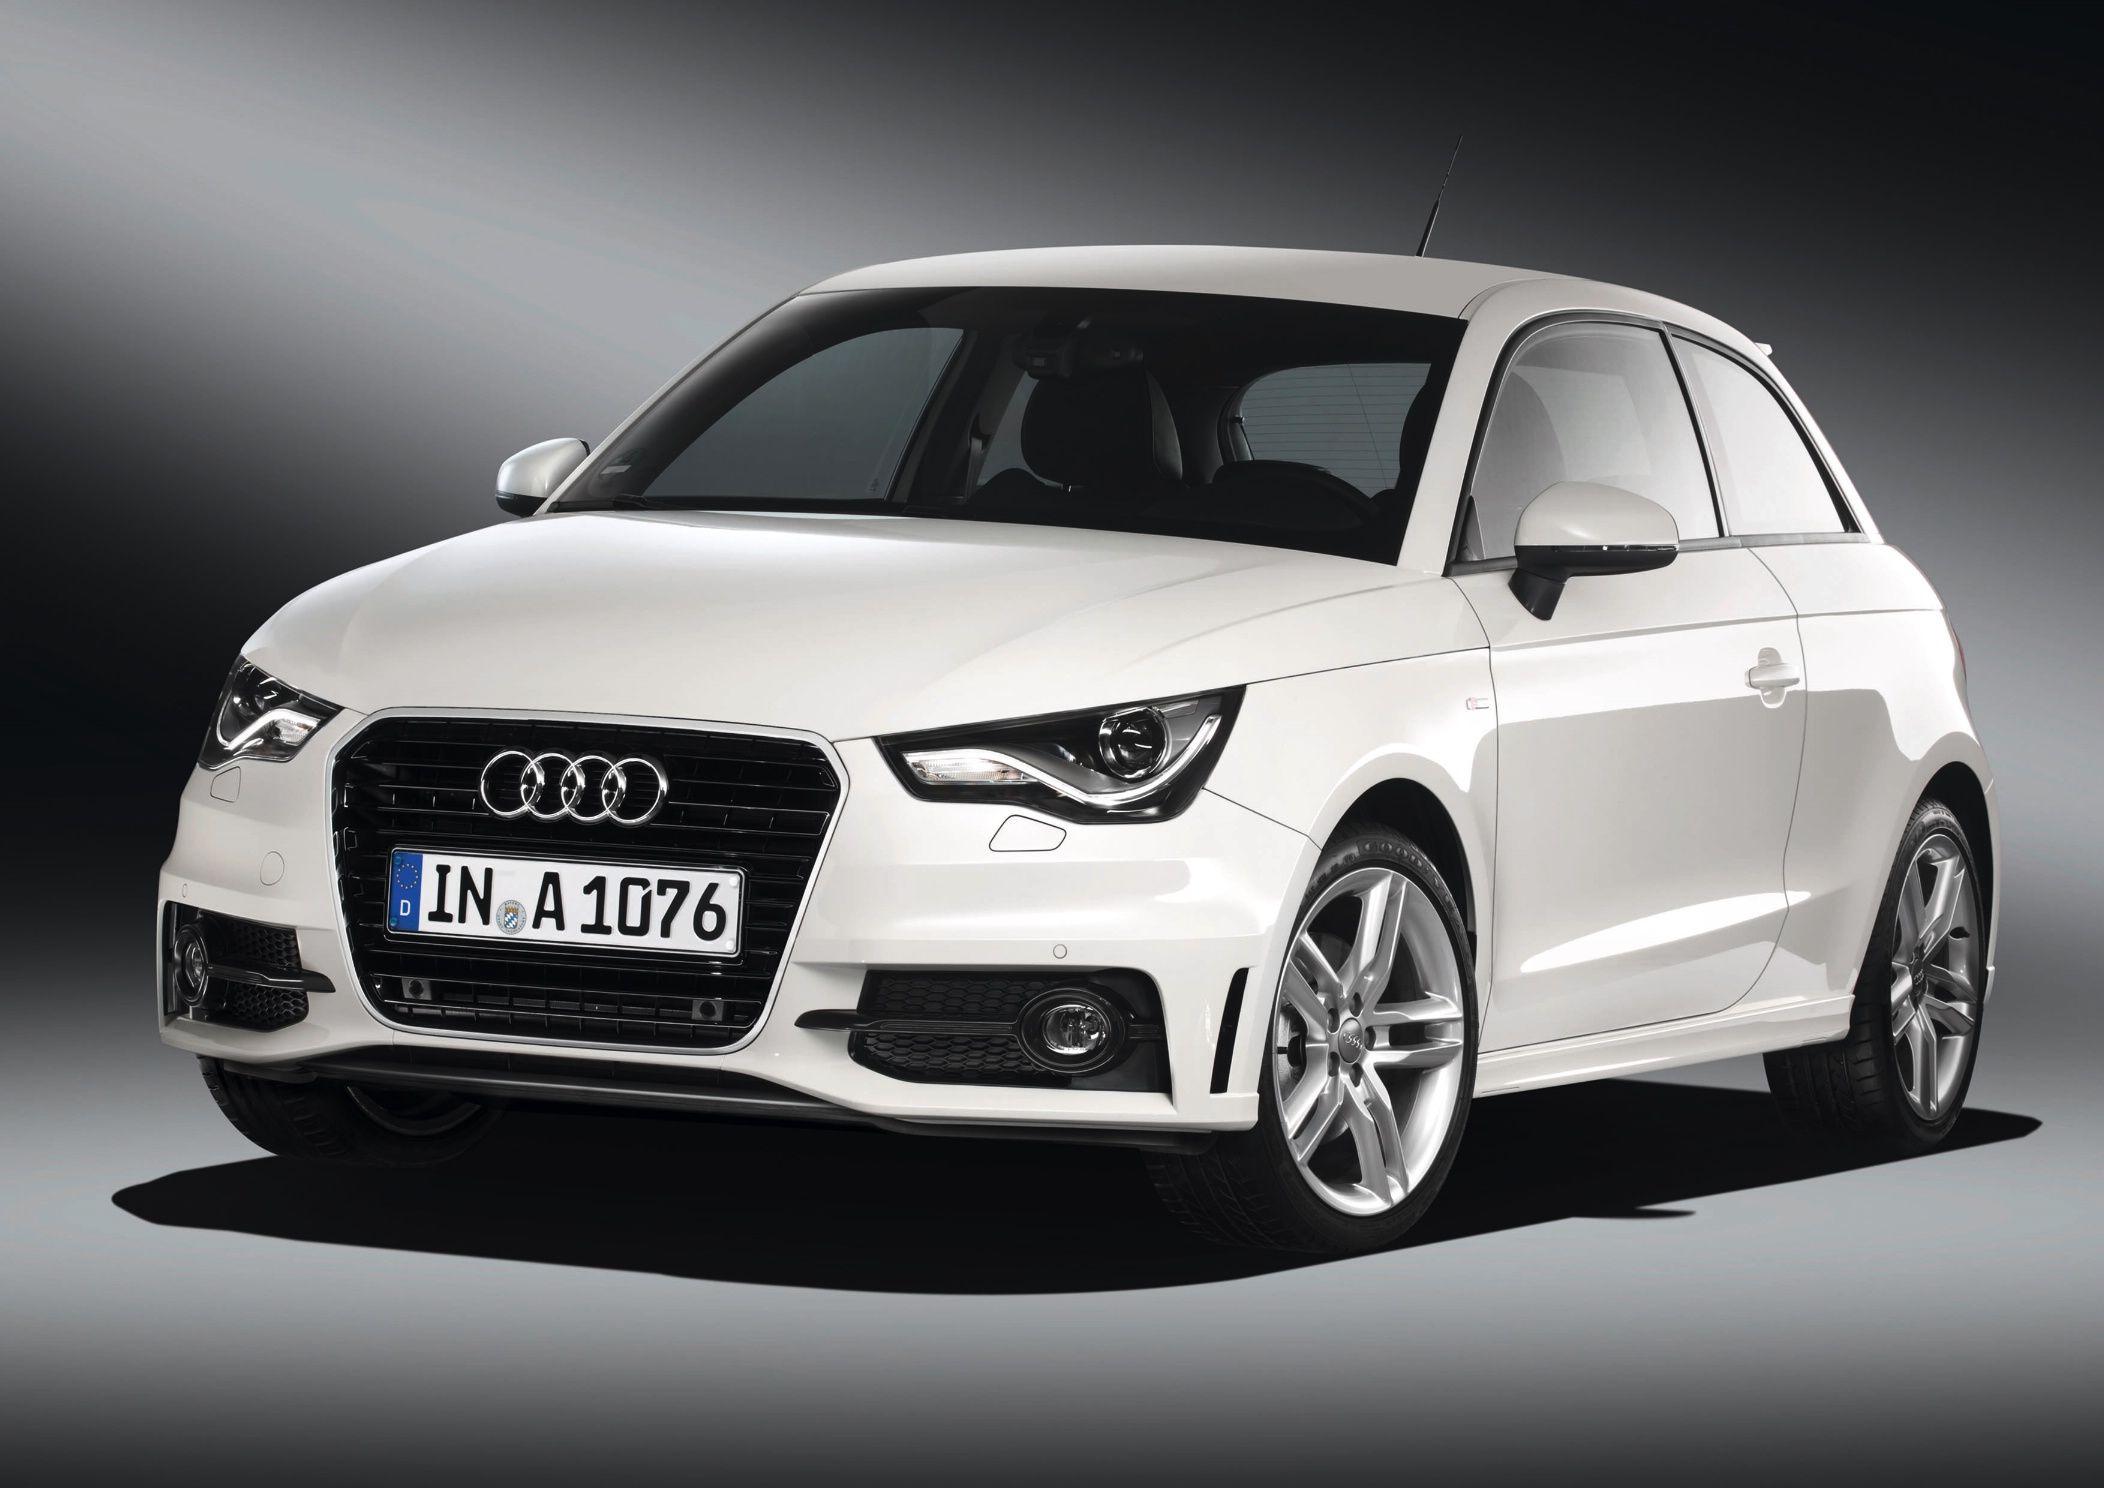 Audi A1 1.4 TFSI 185 CV: immagini e caratteristiche tecniche